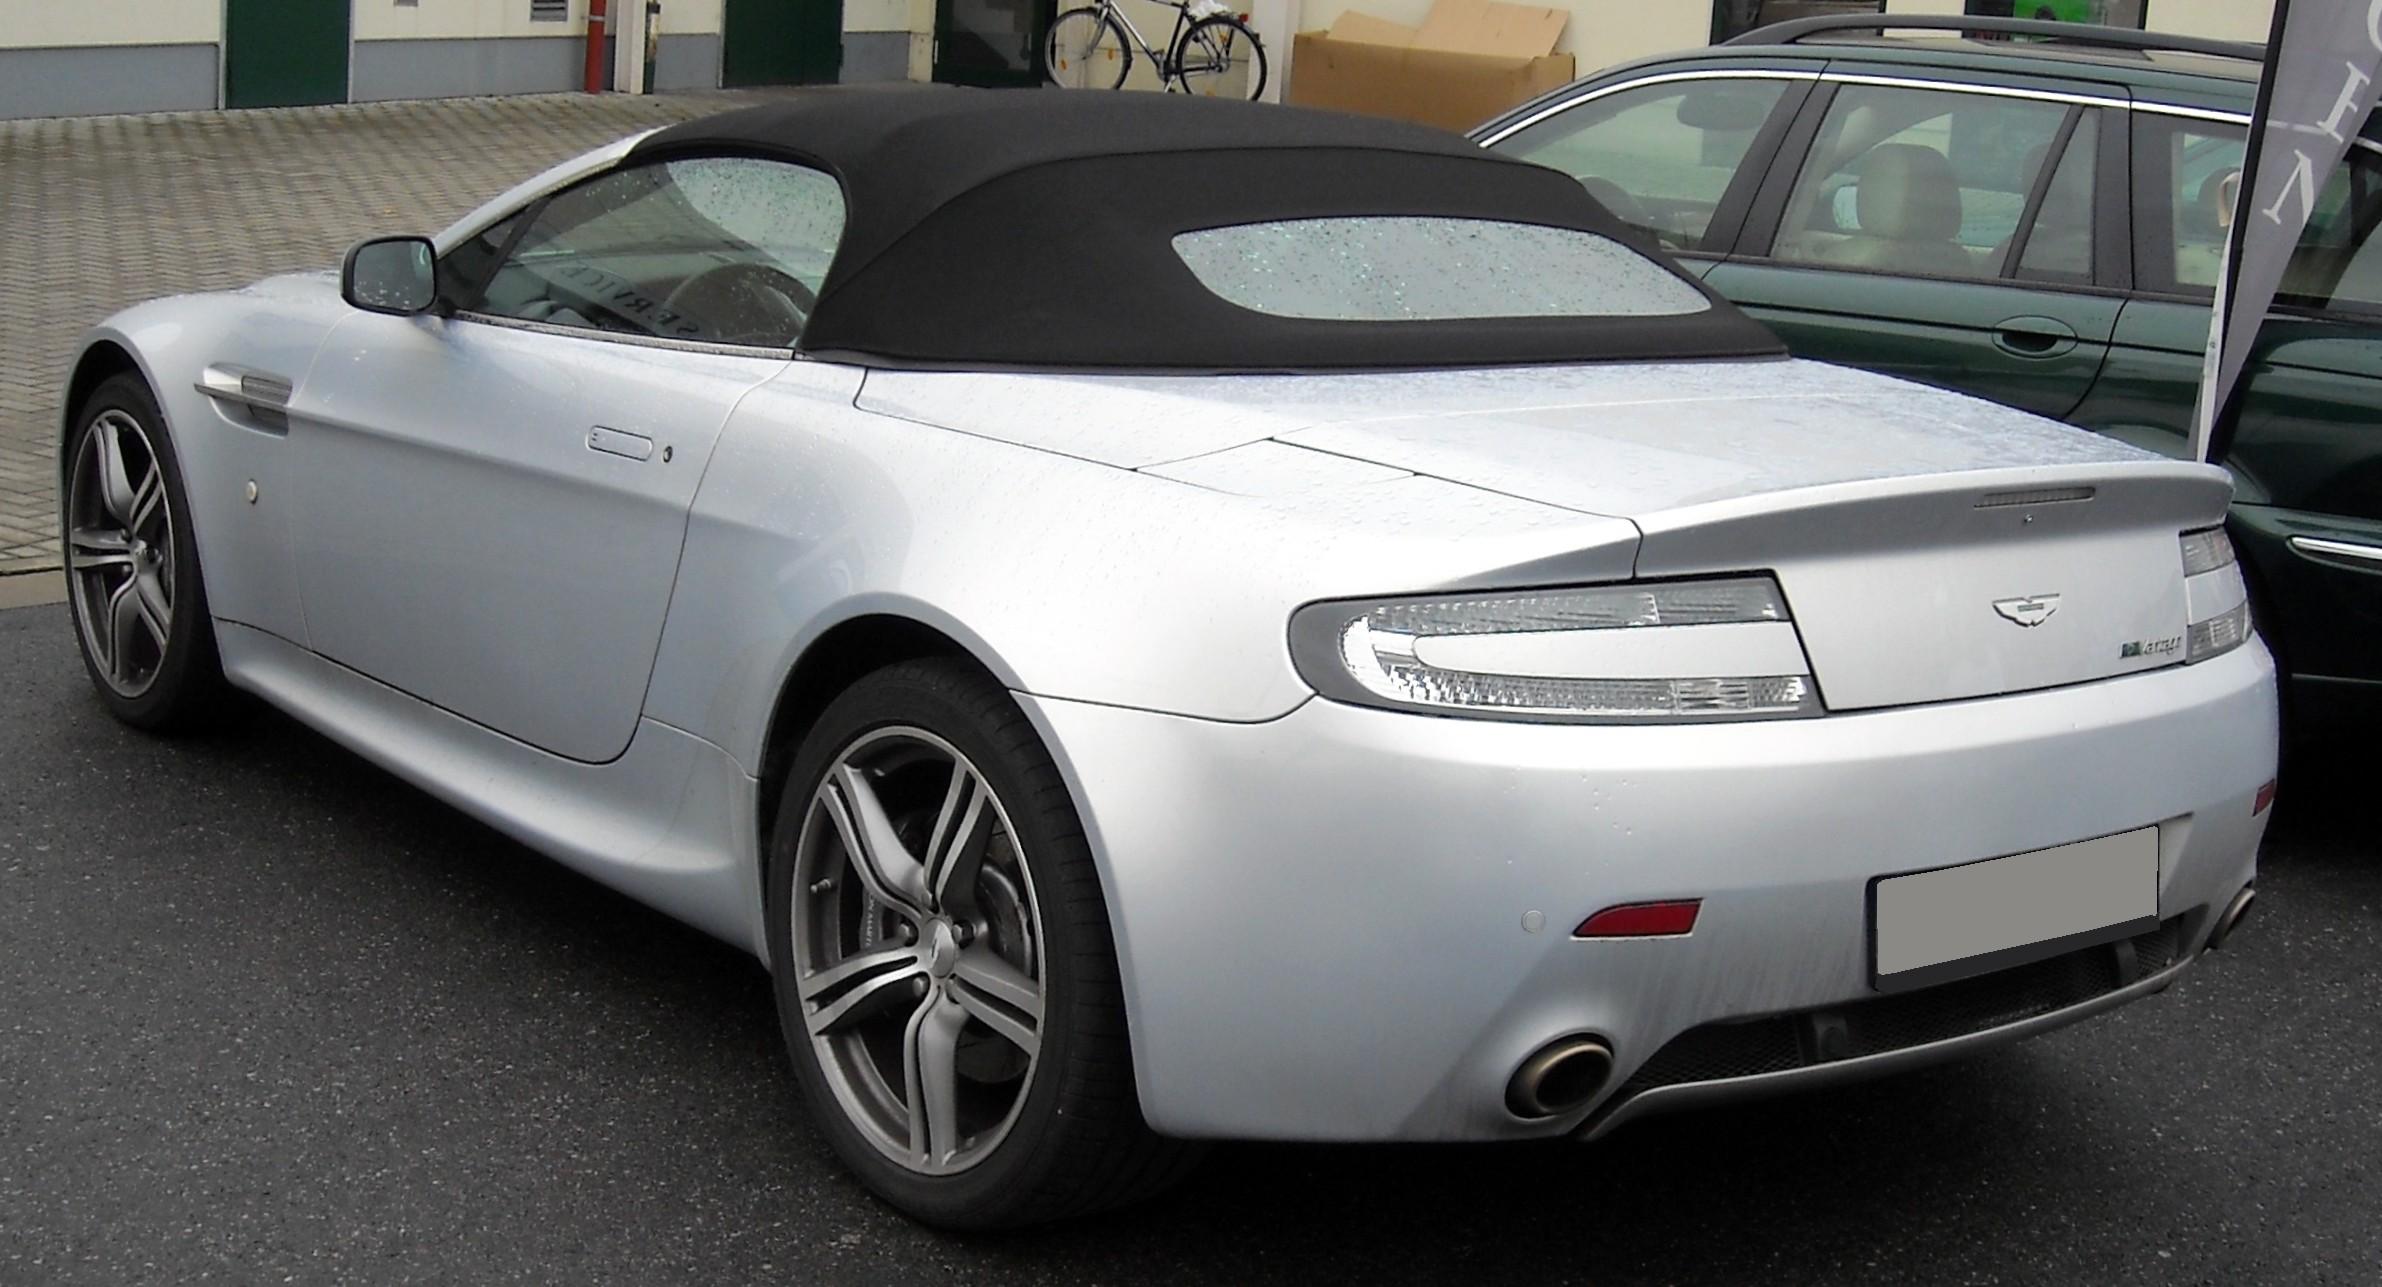 file:aston martin v8 vantage roadster silver rear 20081204